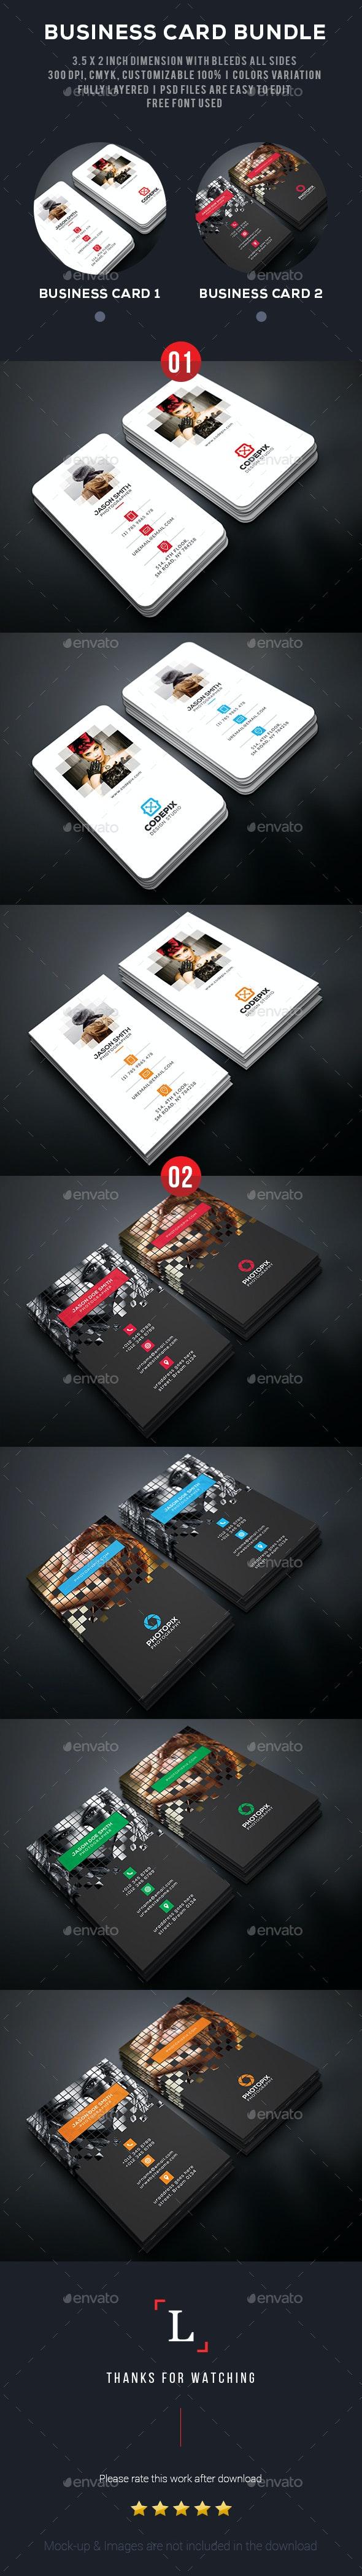 Pixel Business Card Bundle - Business Cards Print Templates